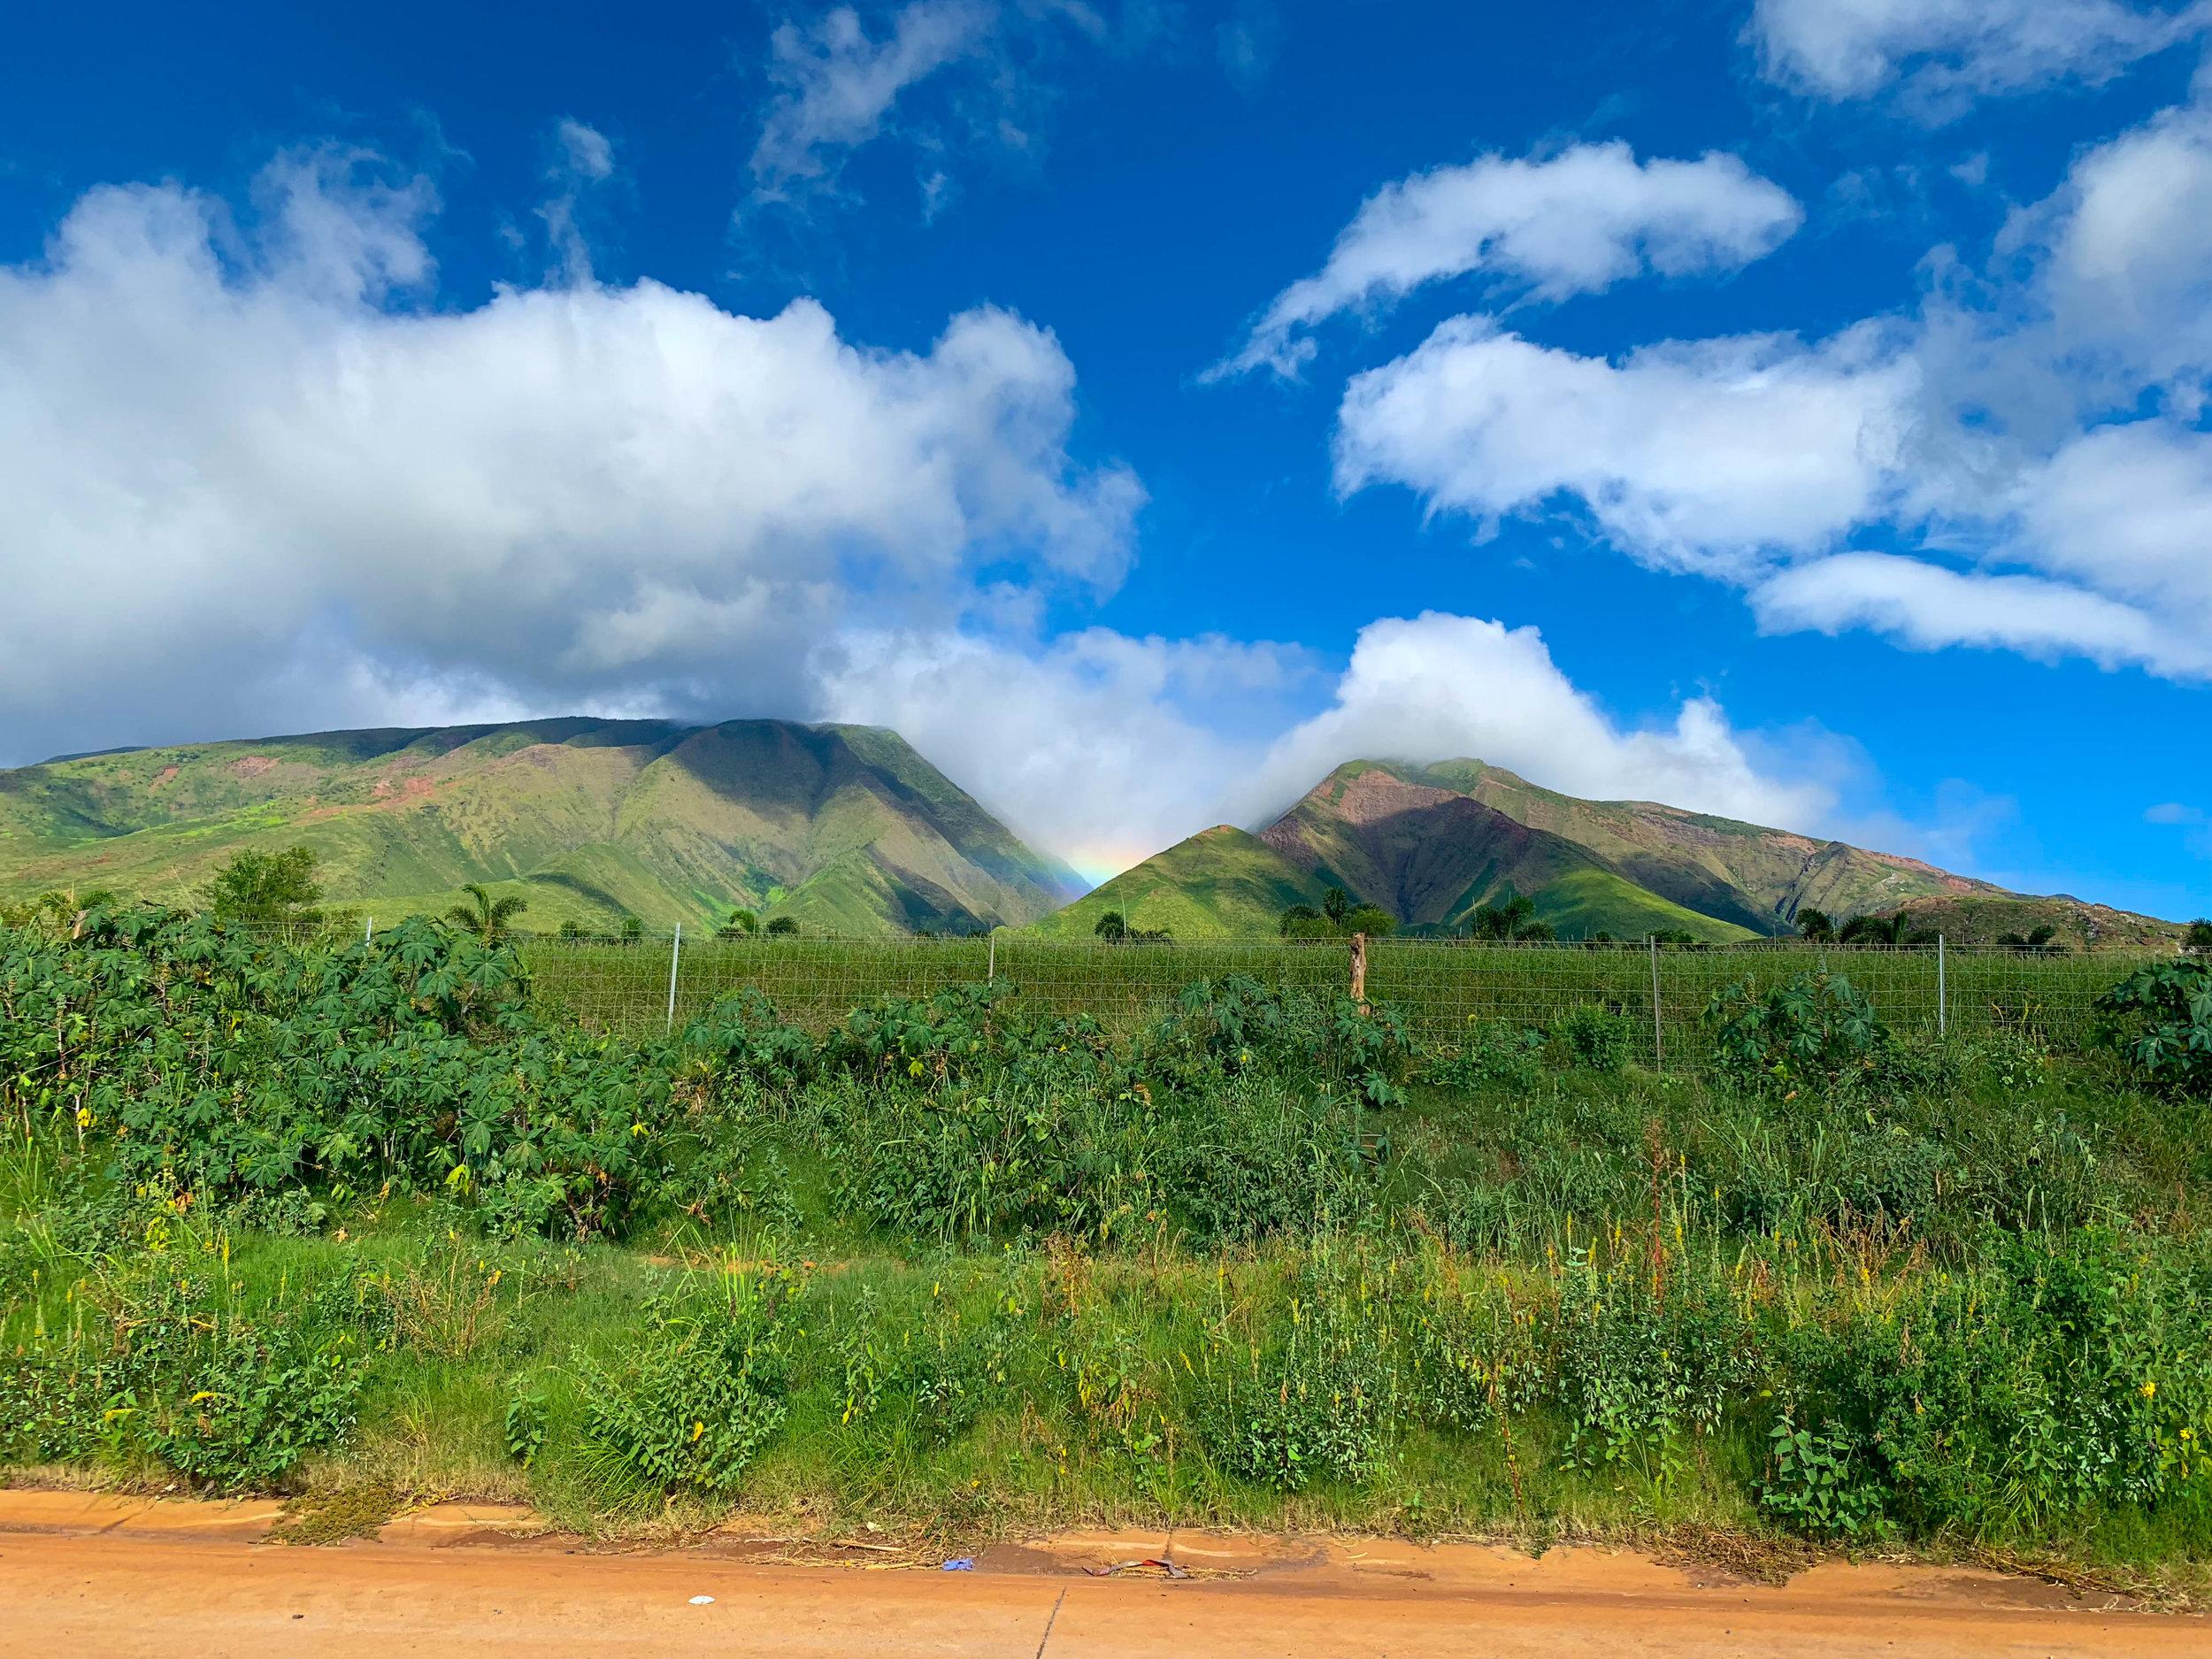 Maui Hawaii - Driving